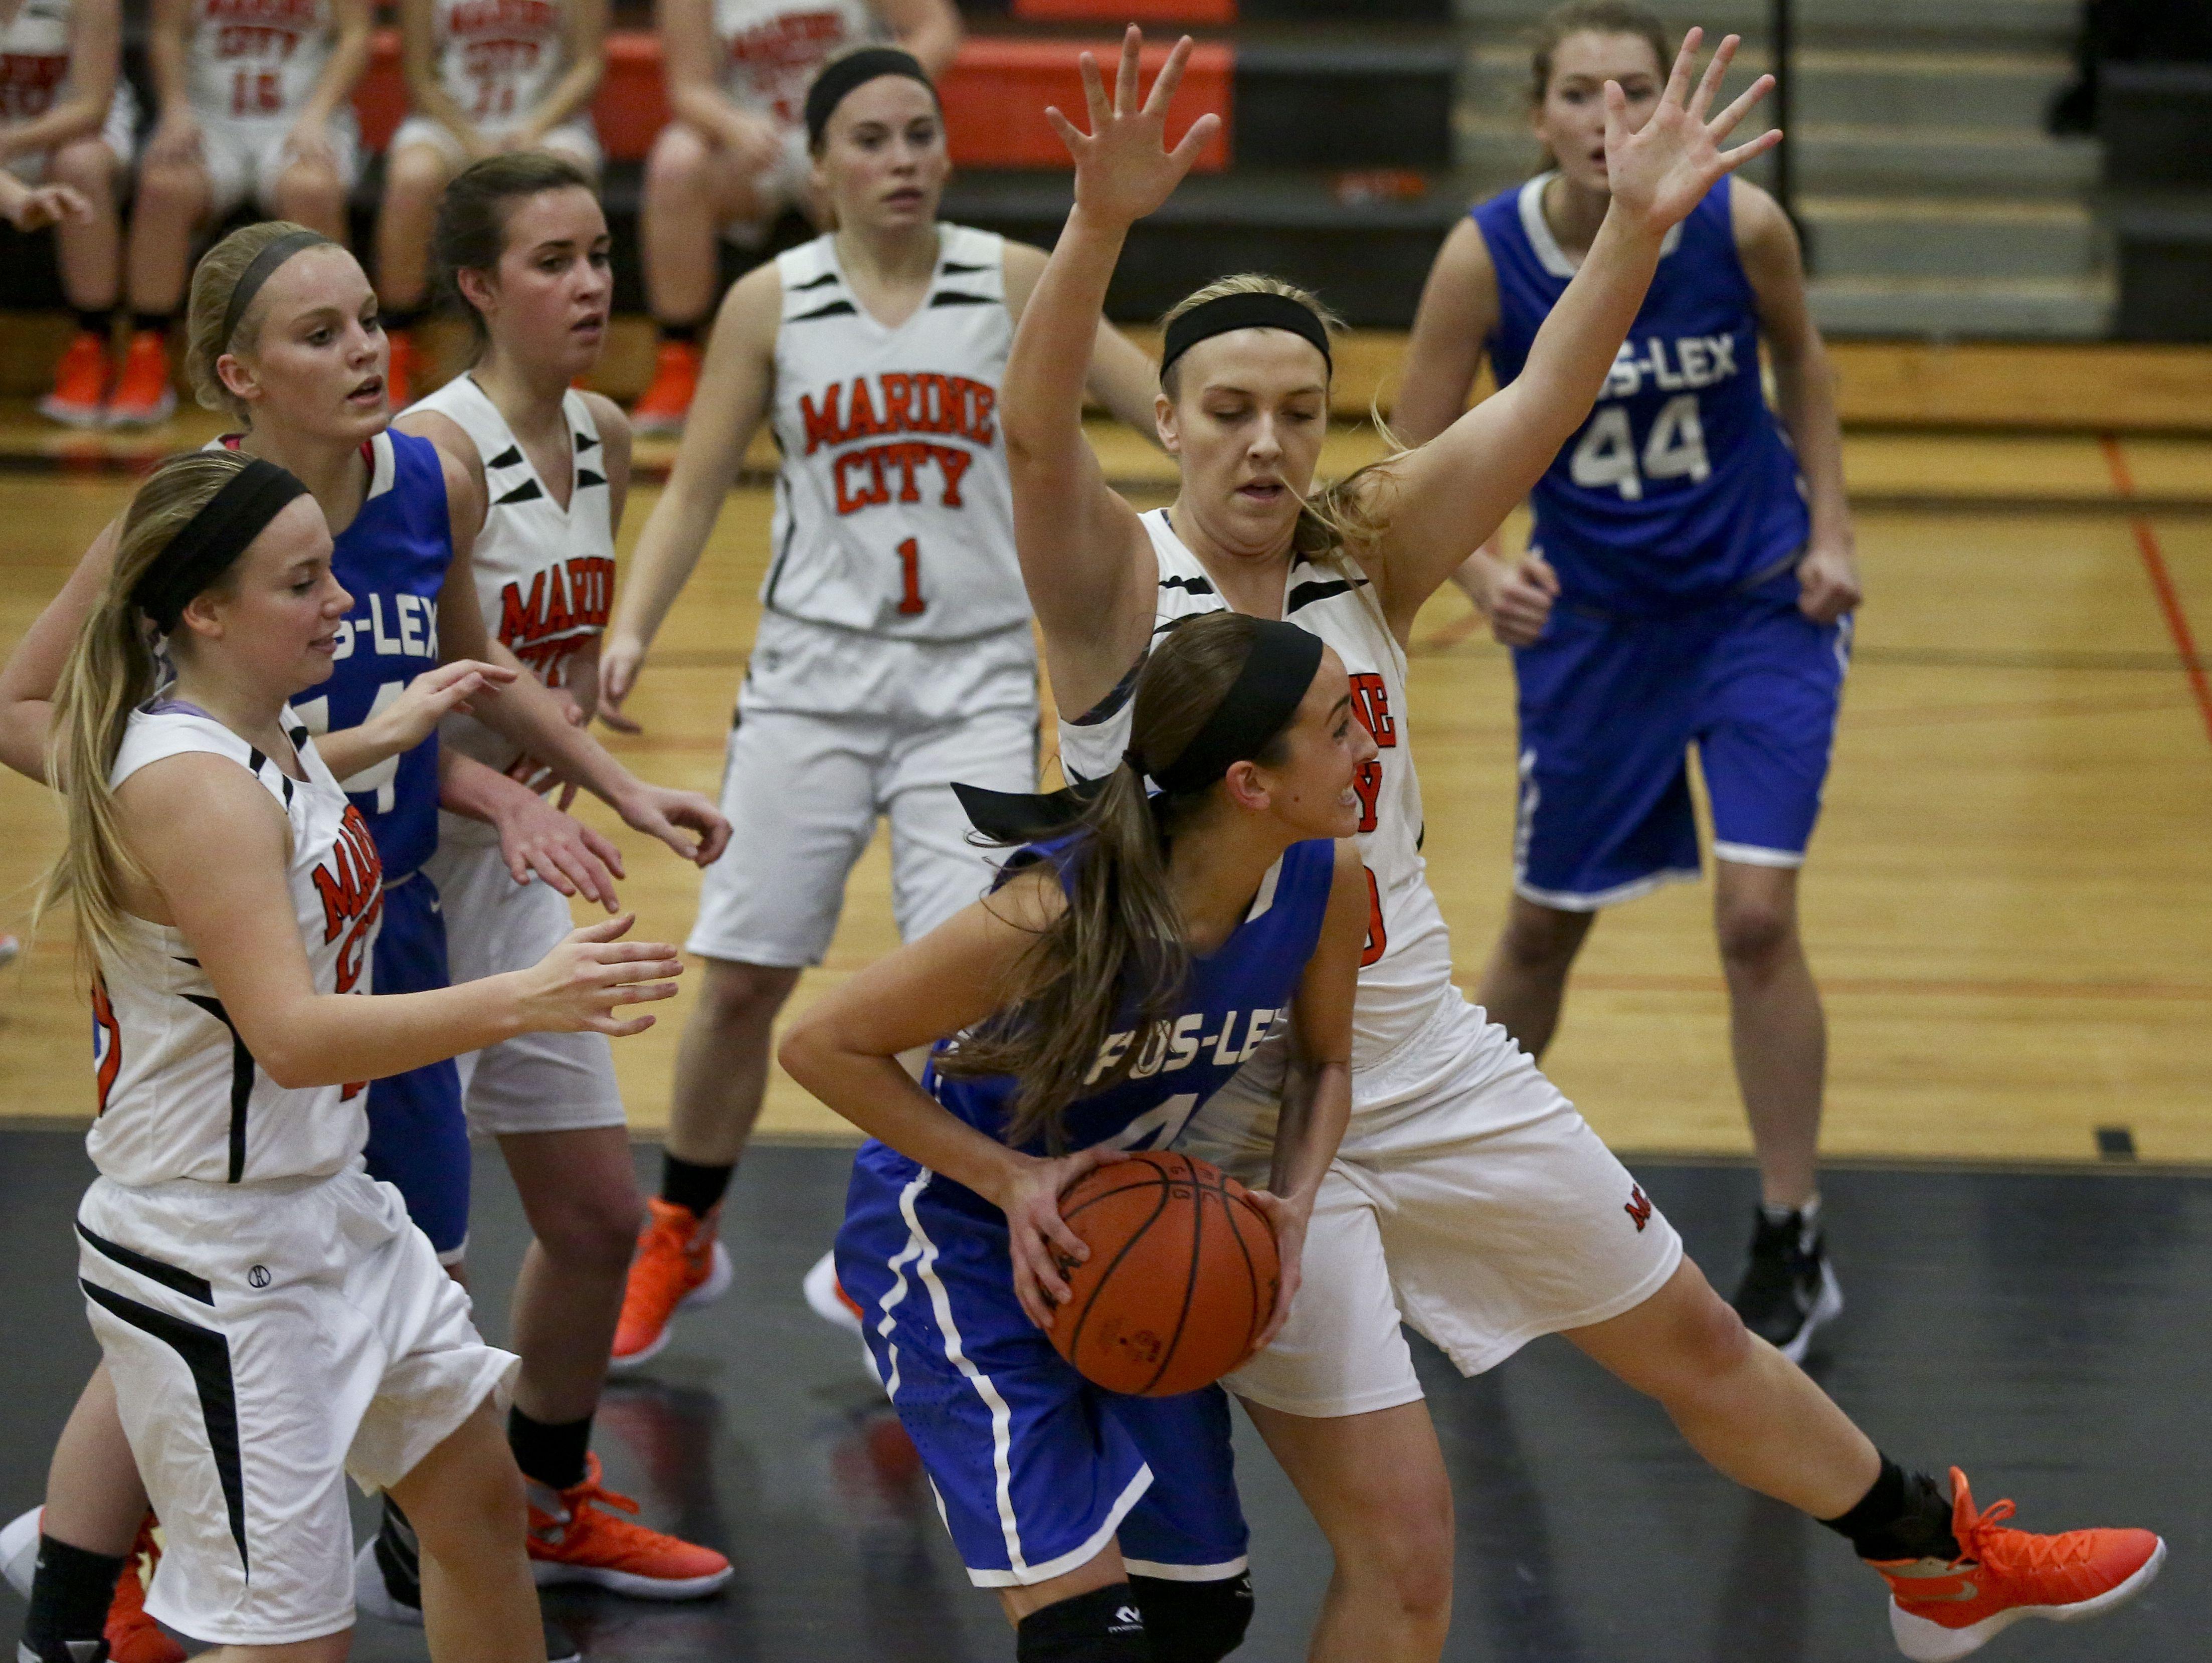 Marine City's Paige Tranchida blocks Cros-Lex's Rachel Soper during a basketball game Tuesday, December 1, 2015 at Marine City High School.